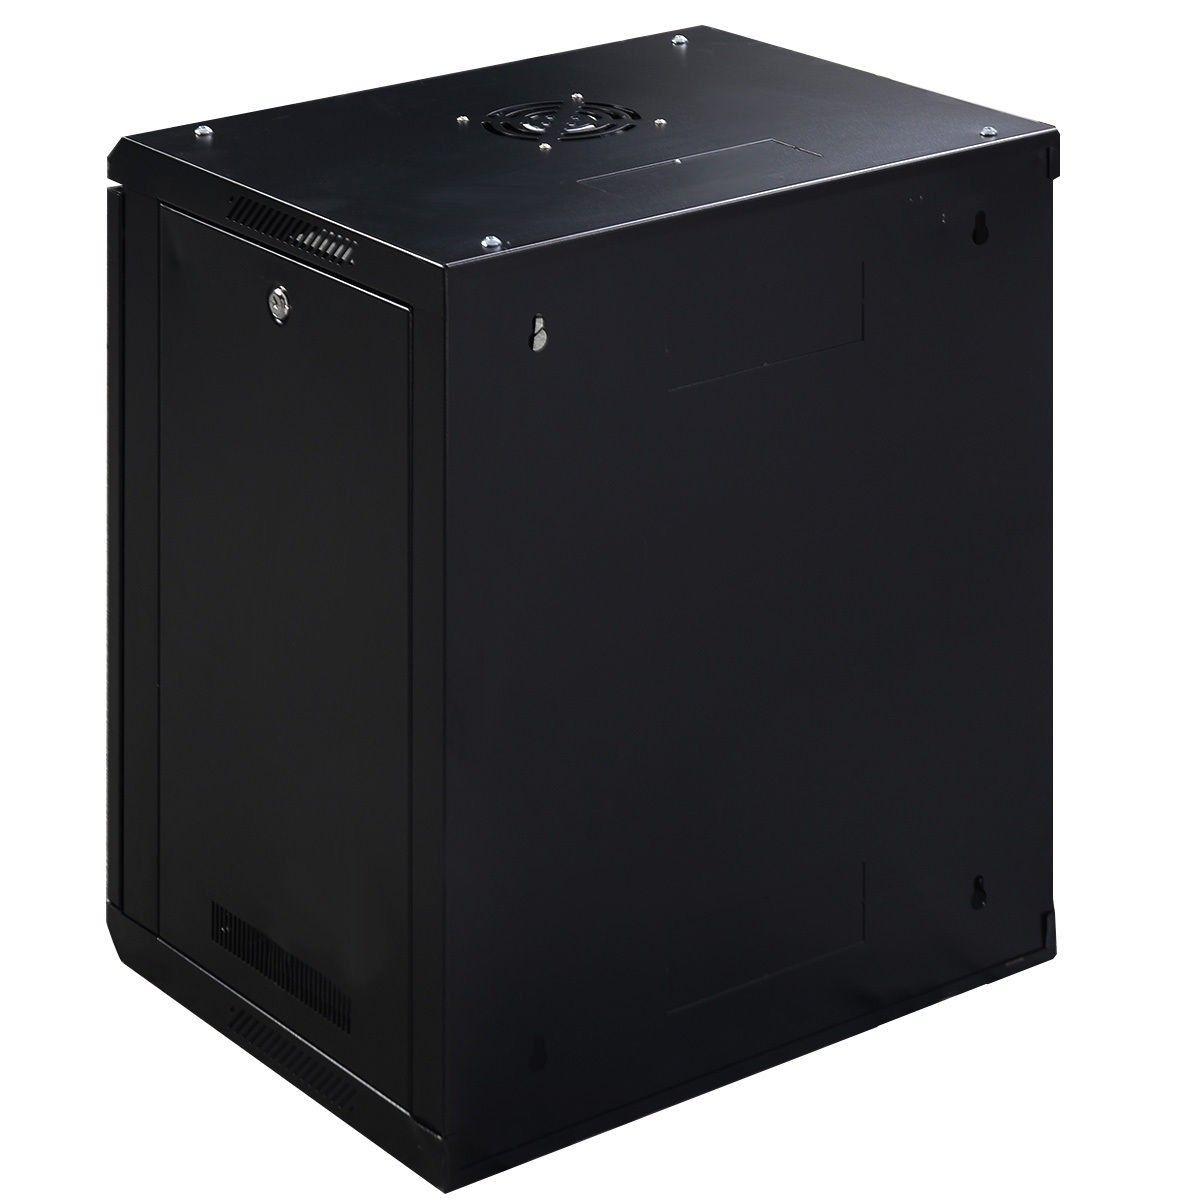 12u Wall Mount Network Server Data Cabinet Enclosure Rack Glass Door Lock Glass Door Glass Door Lock Data Cabinet